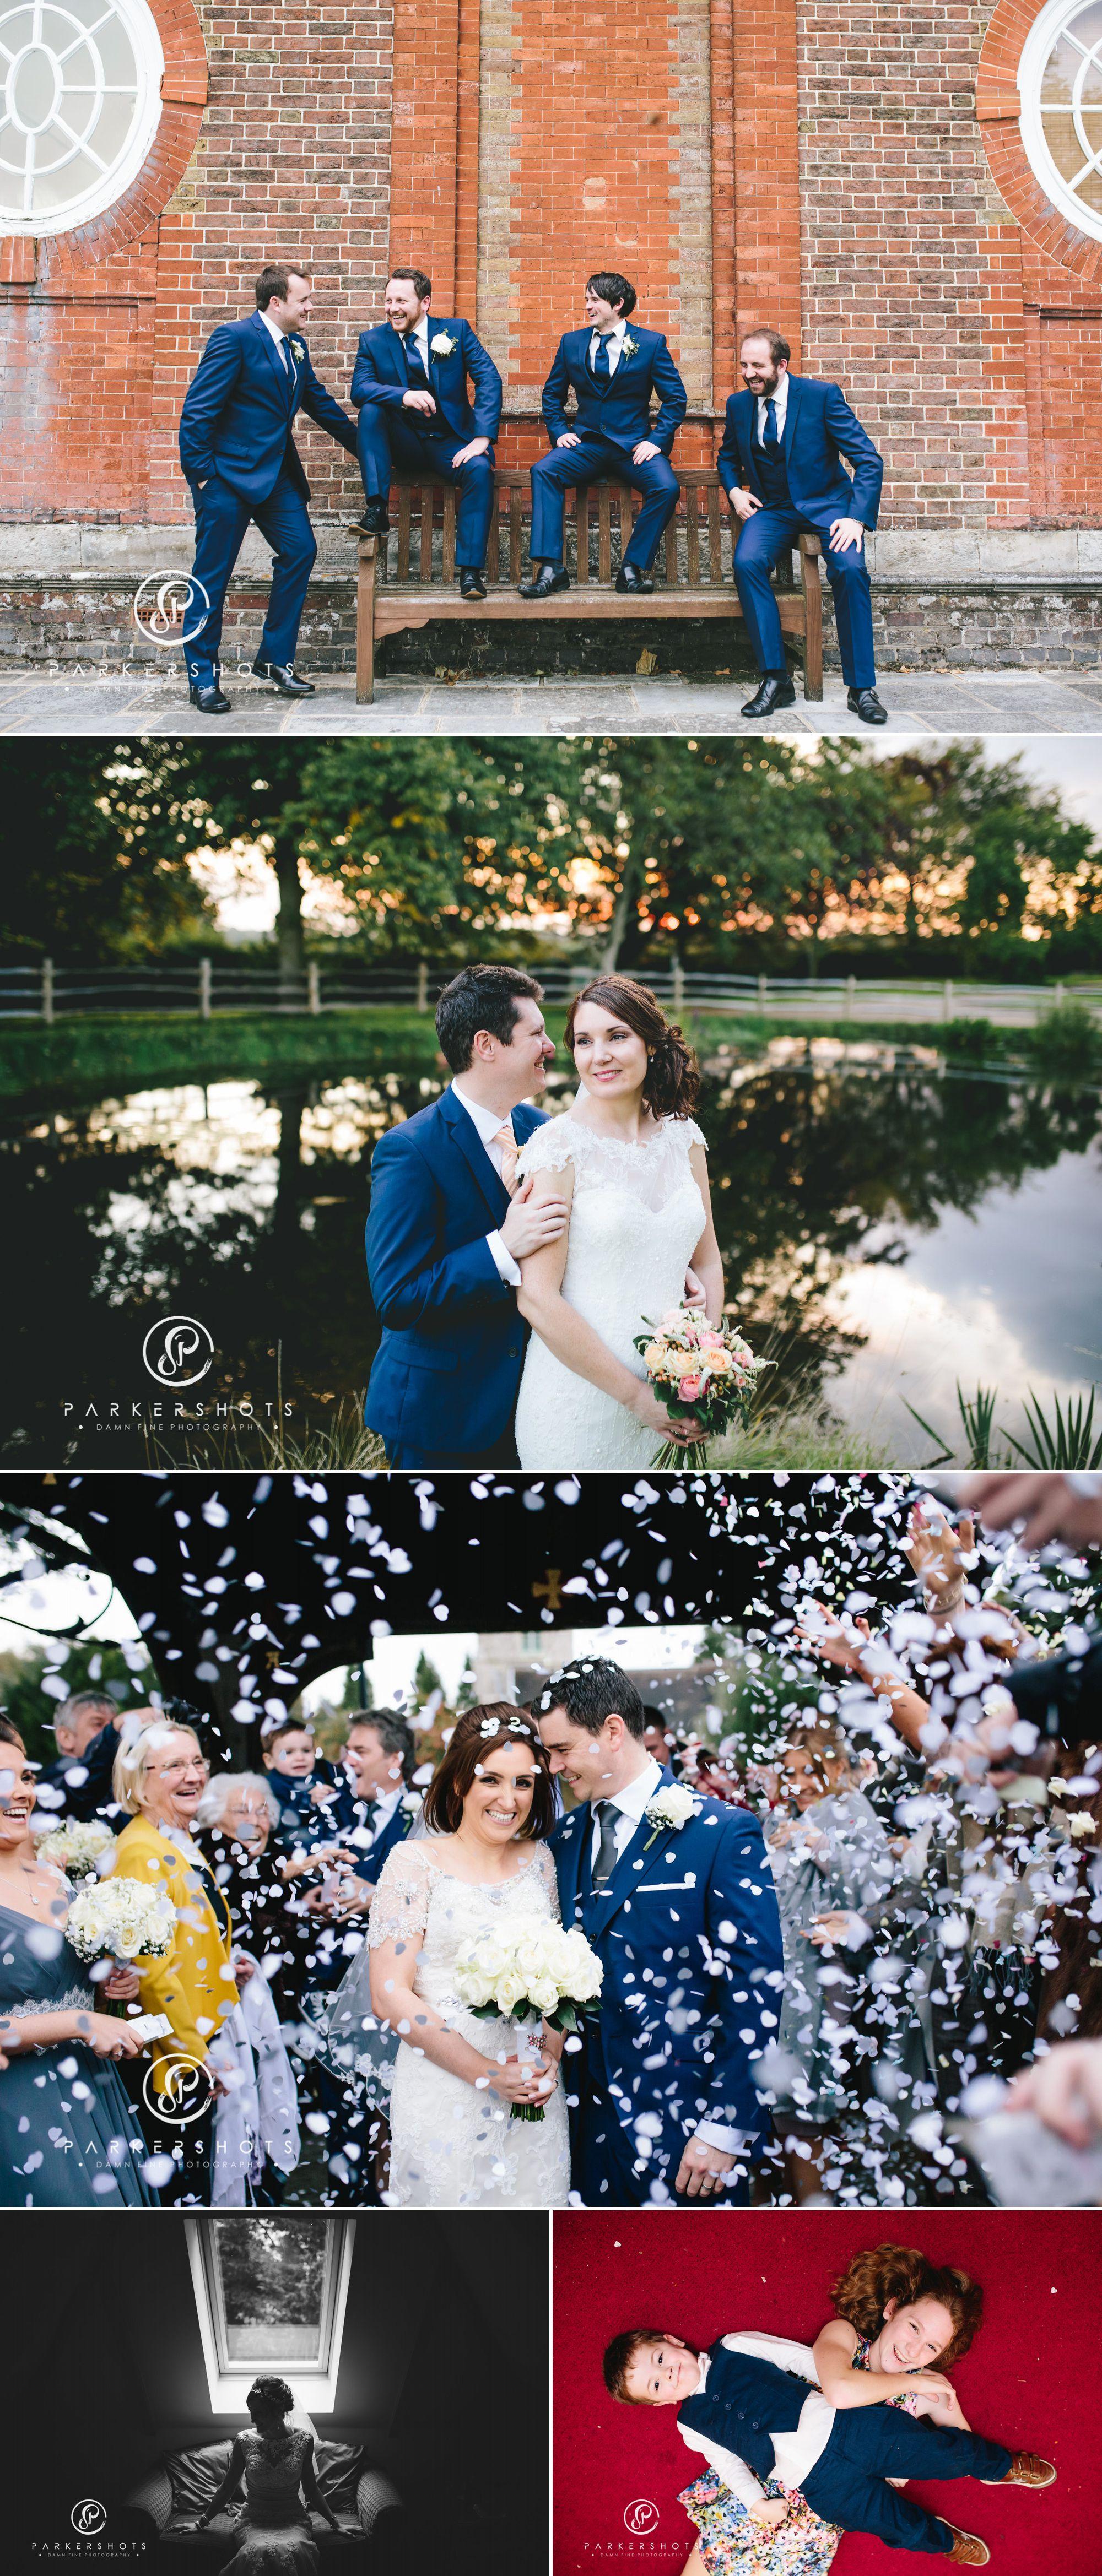 Best_Of_Wedding_Photographer_2015 28